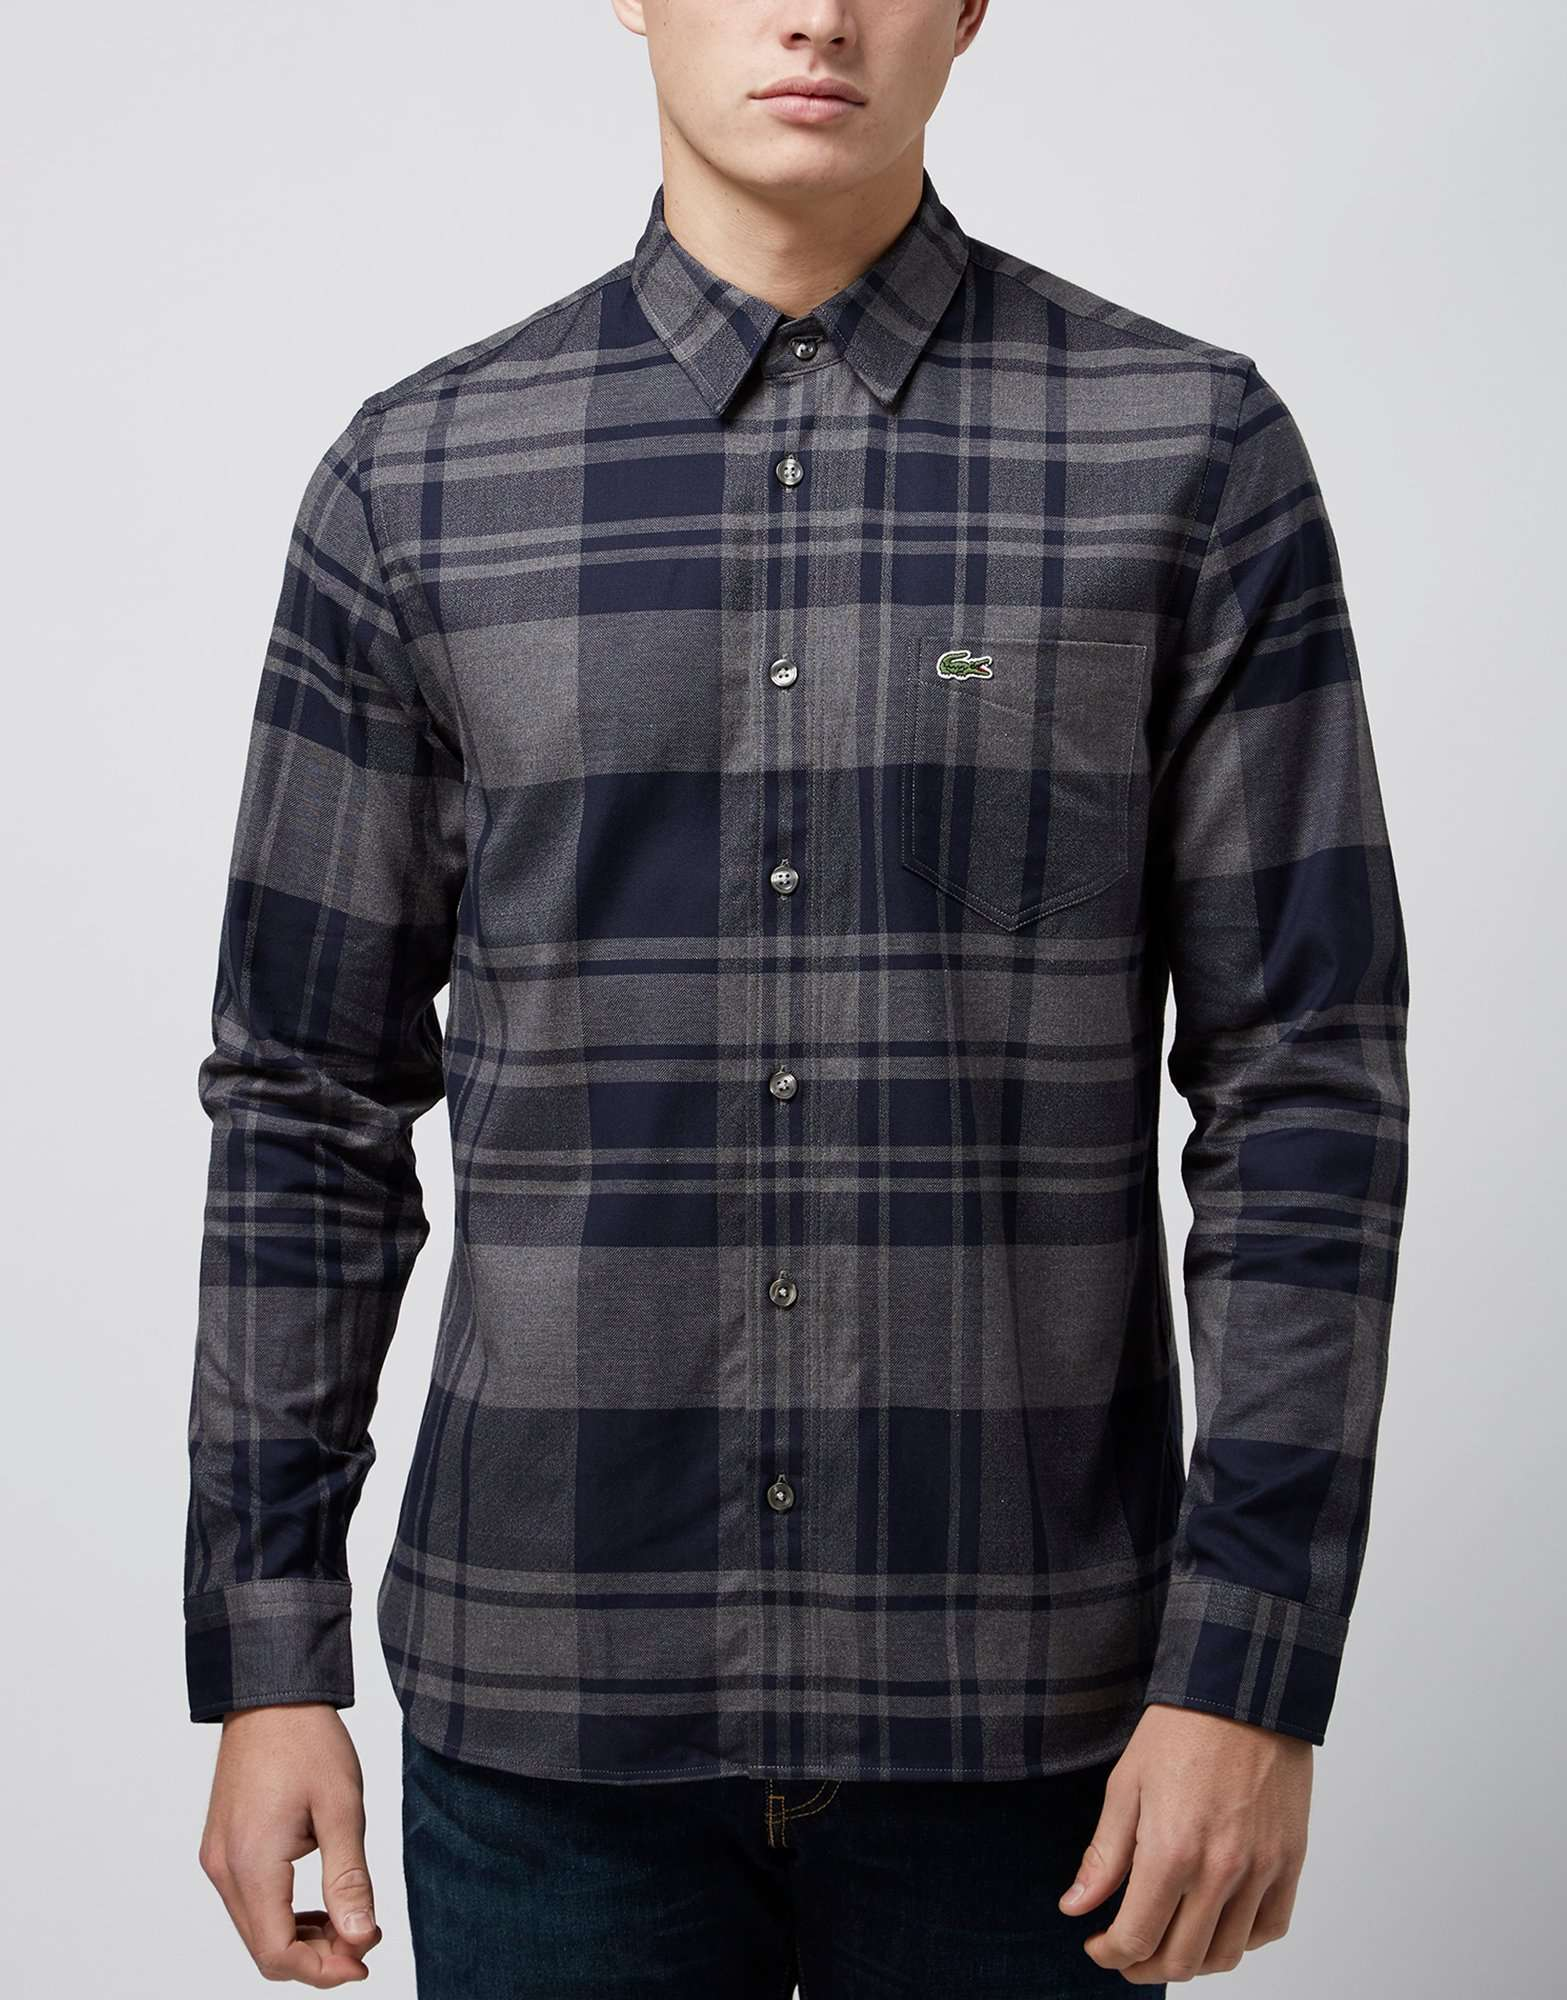 0caa37fb3dd01 Lacoste Flannel Check Shirt